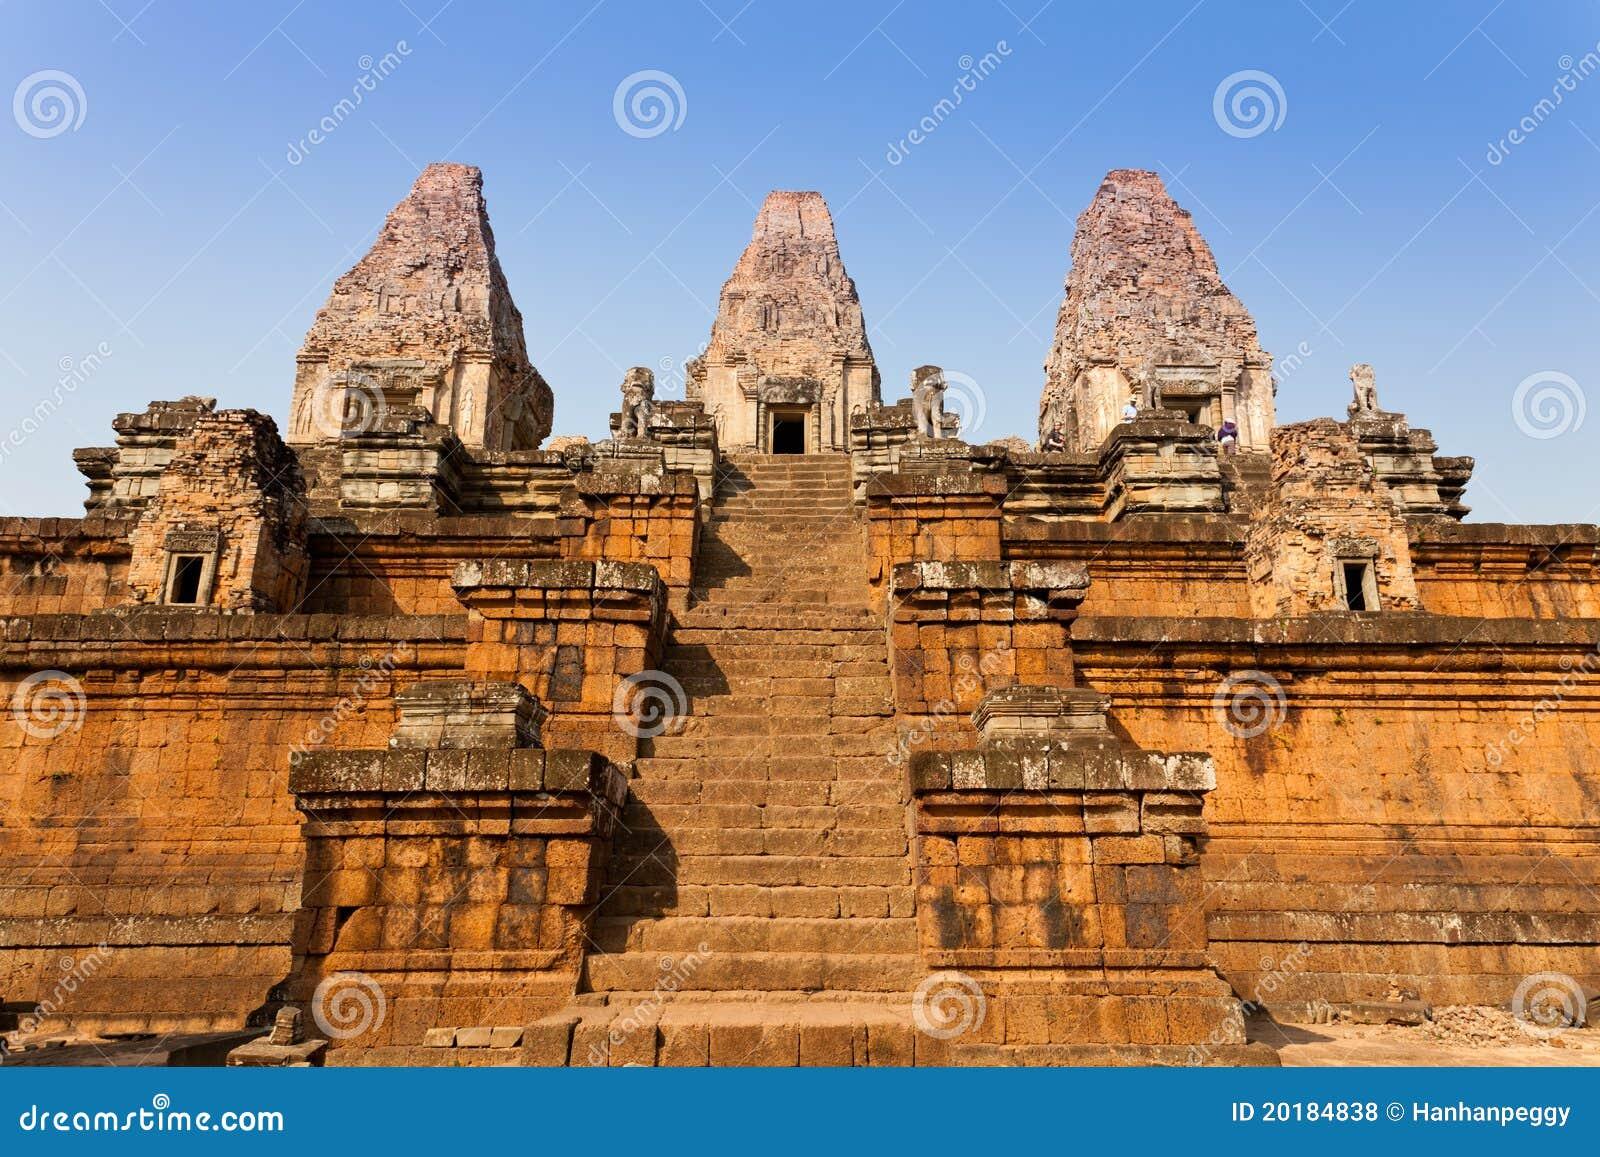 Siem Reap Travel Place